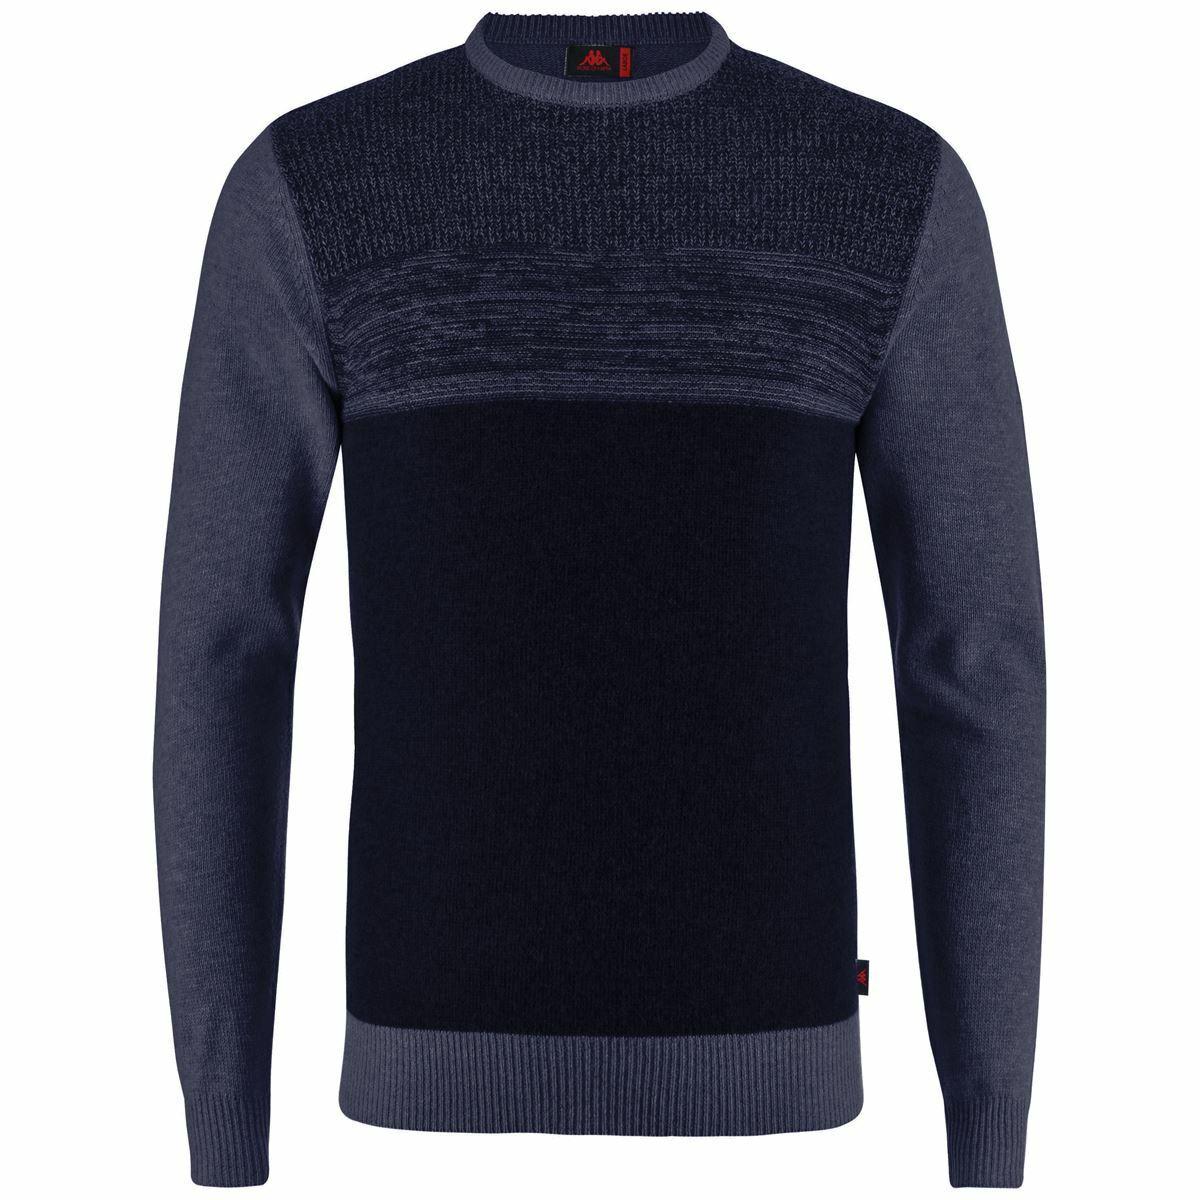 Robe di Kappa Knitwear Sweater Man JES Classic PULL OVER